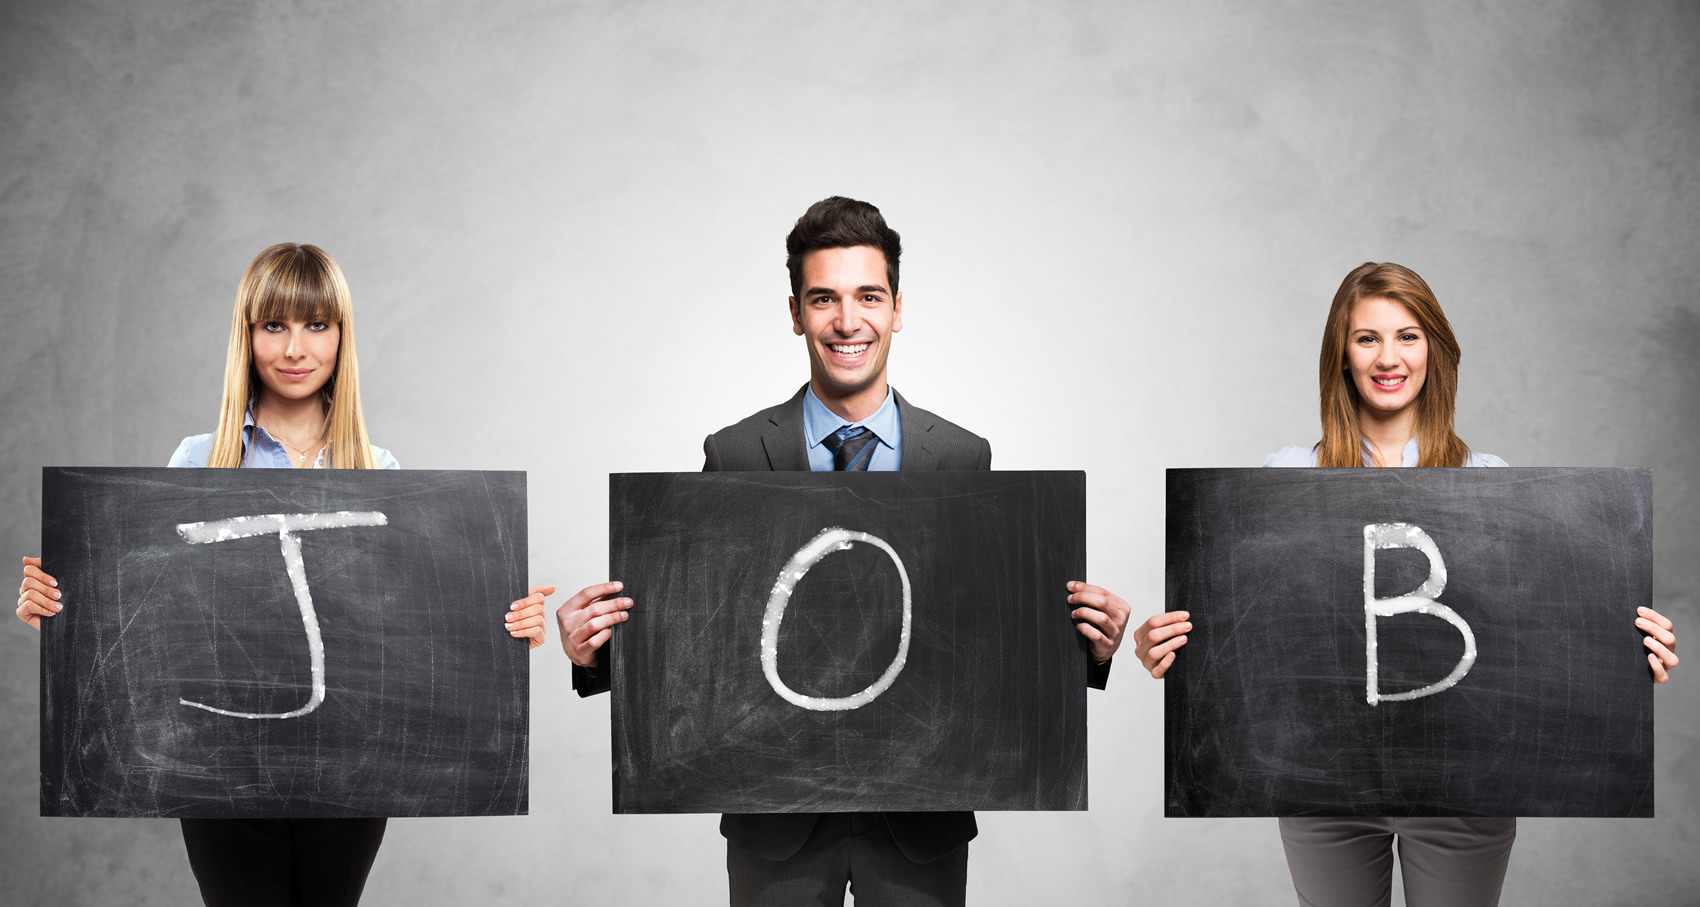 Inside Sales Representative/Closer/ Bilingual in Spanish